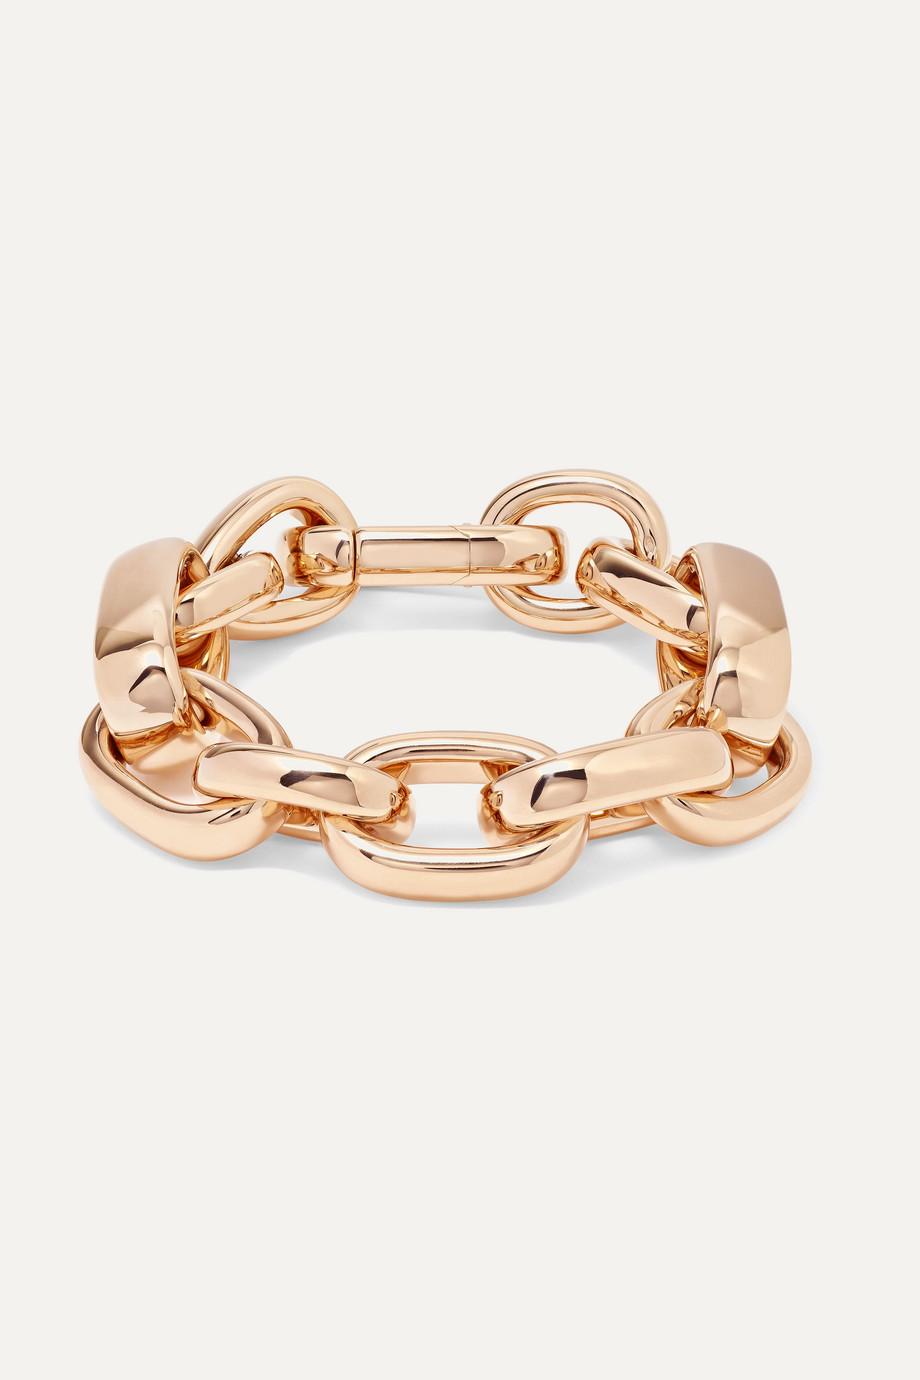 Pomellato 18-karat rose gold bracelet